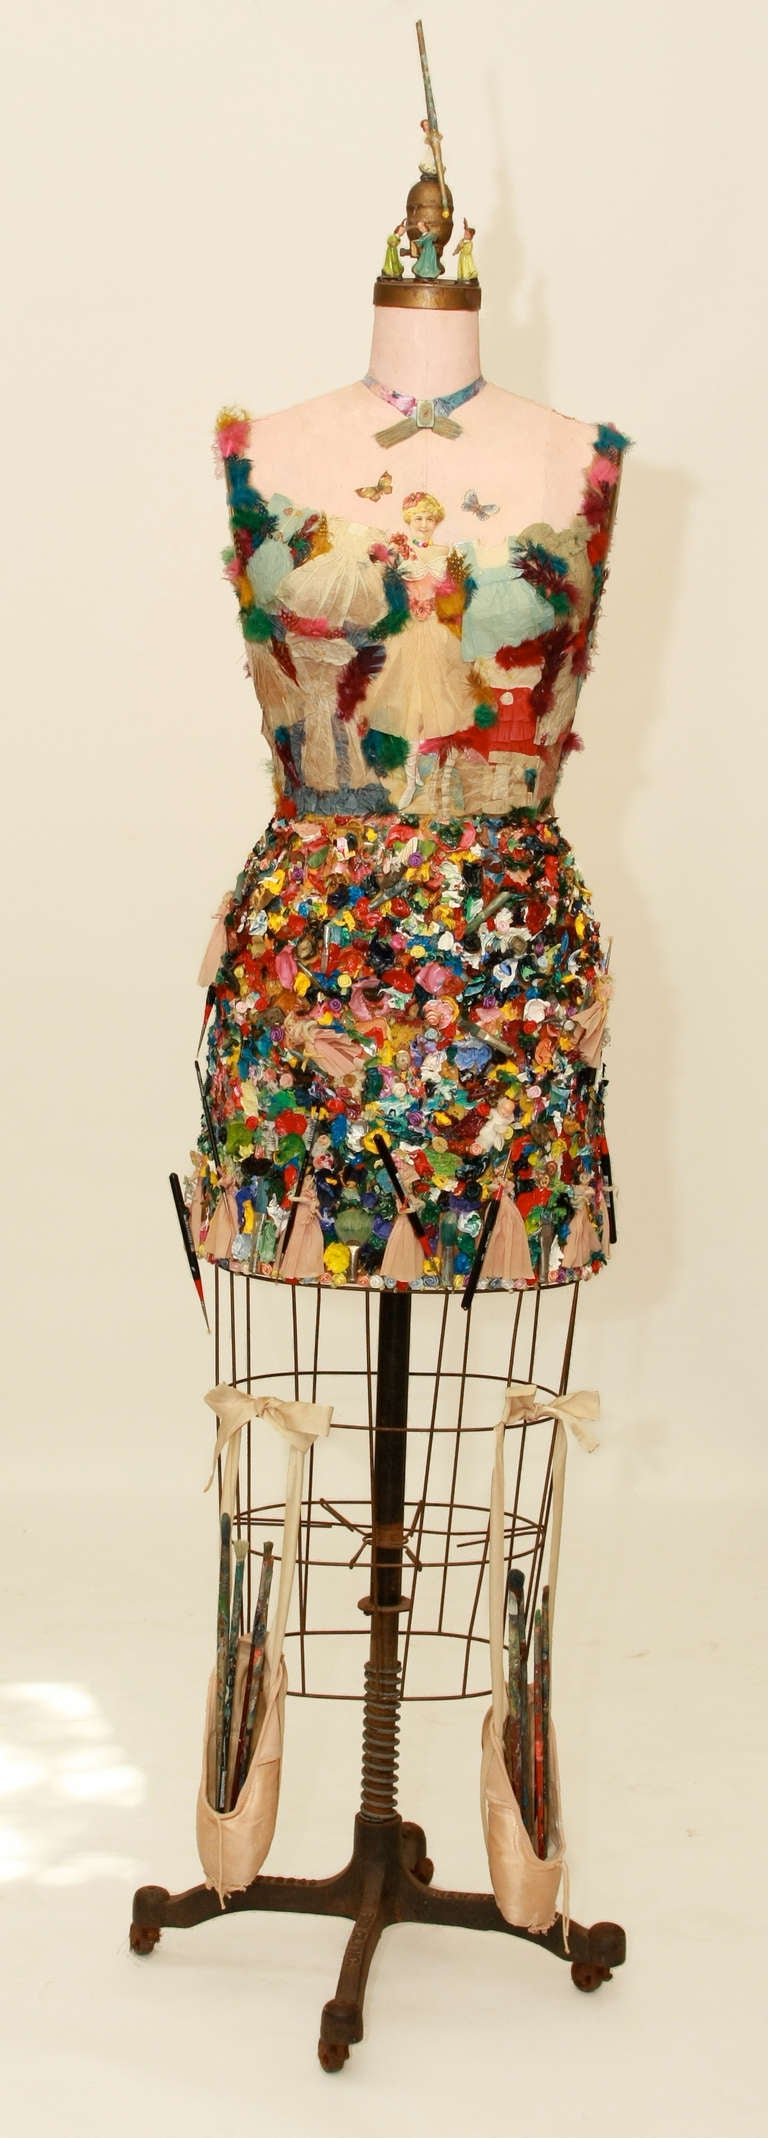 Mexican paper mache vintage judas sculpture folk art at 1stdibs - Mixed Media Vintage Dress Form Sculpture 2